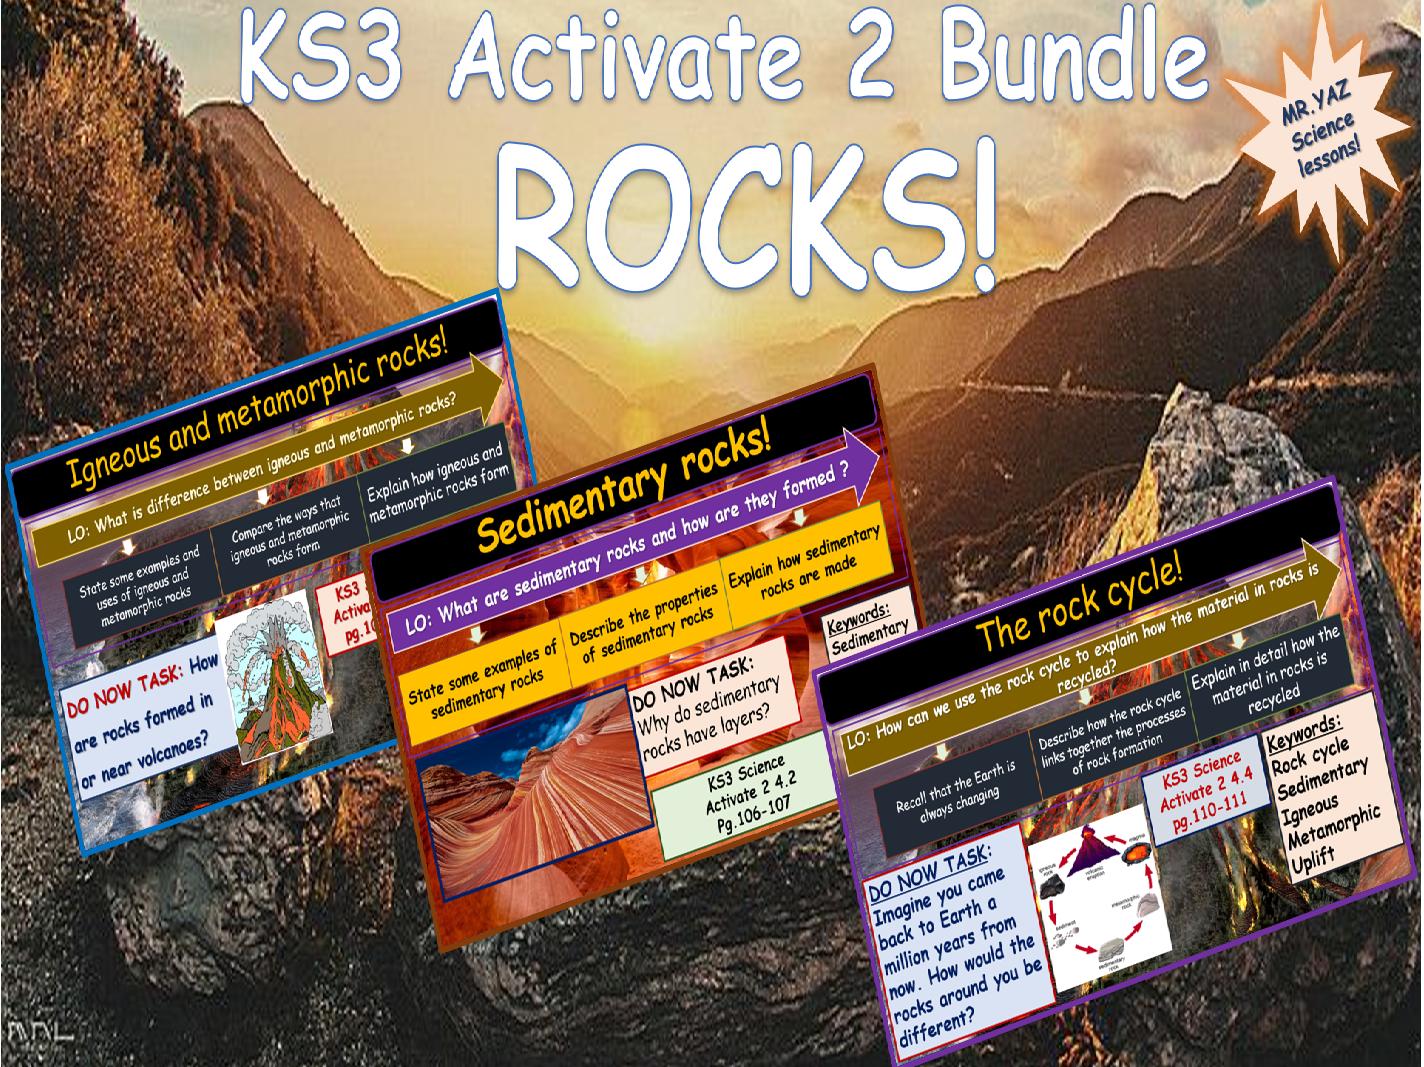 Rocks bundle Activate 2 KS3 Science